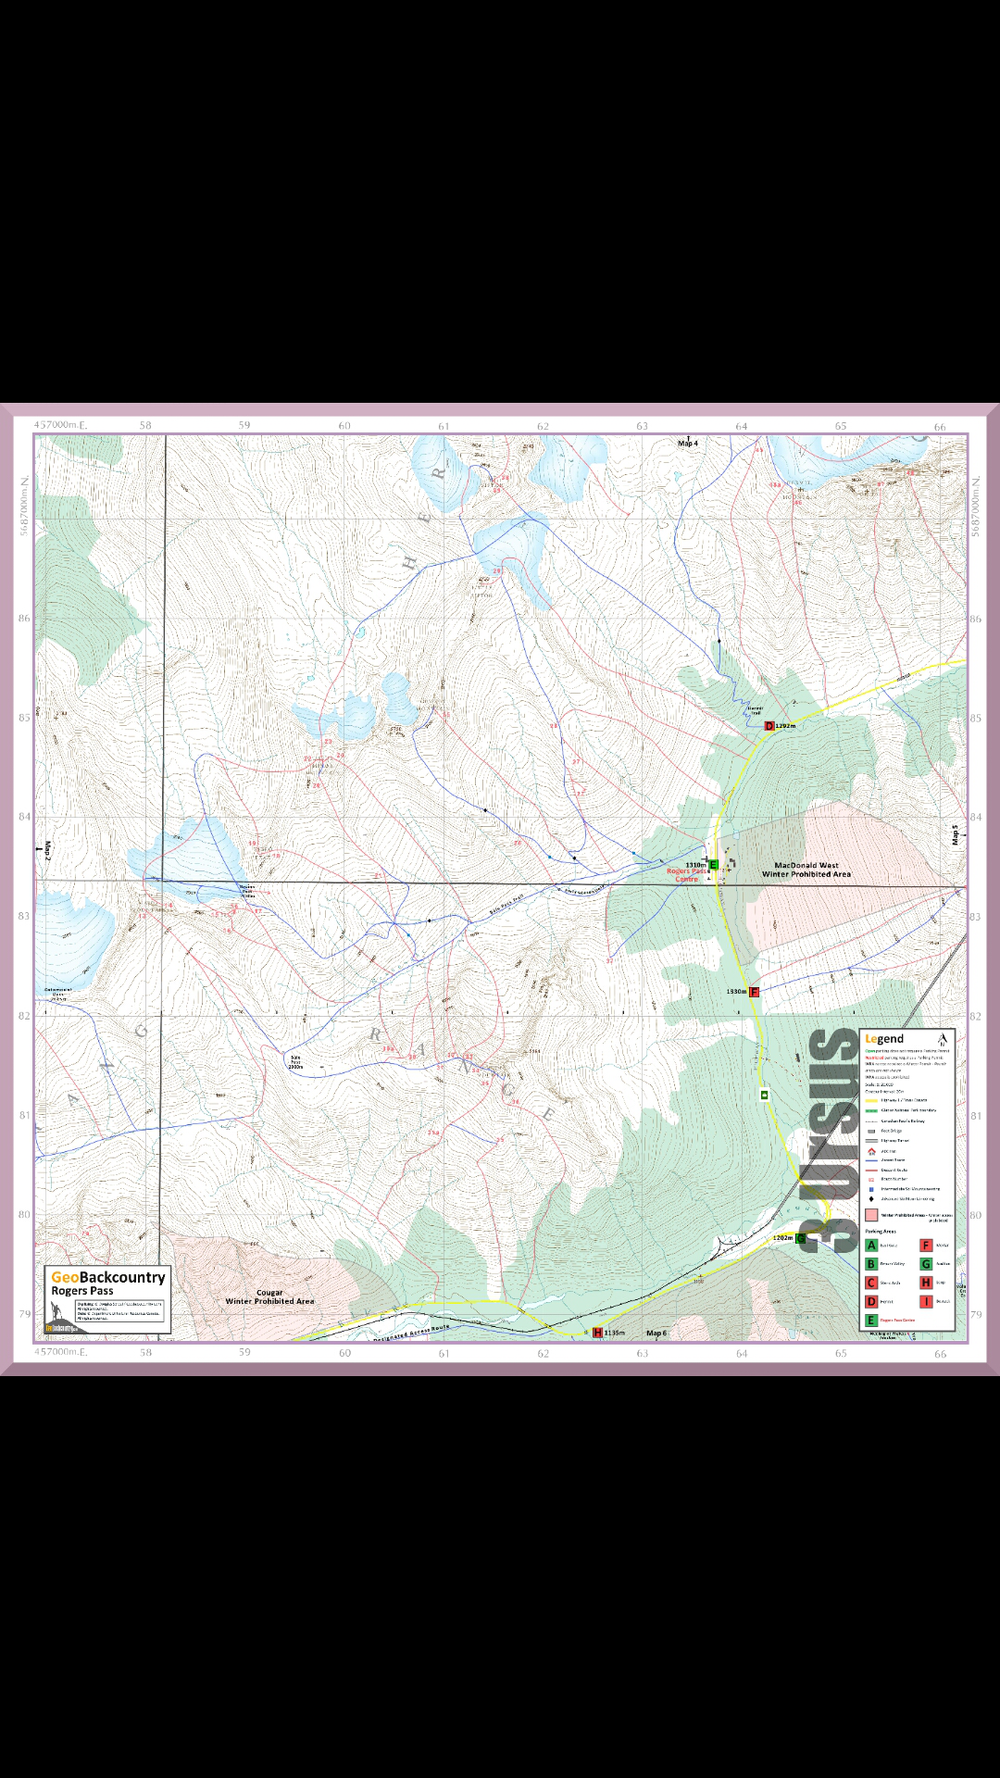 Image 11: Map 3.